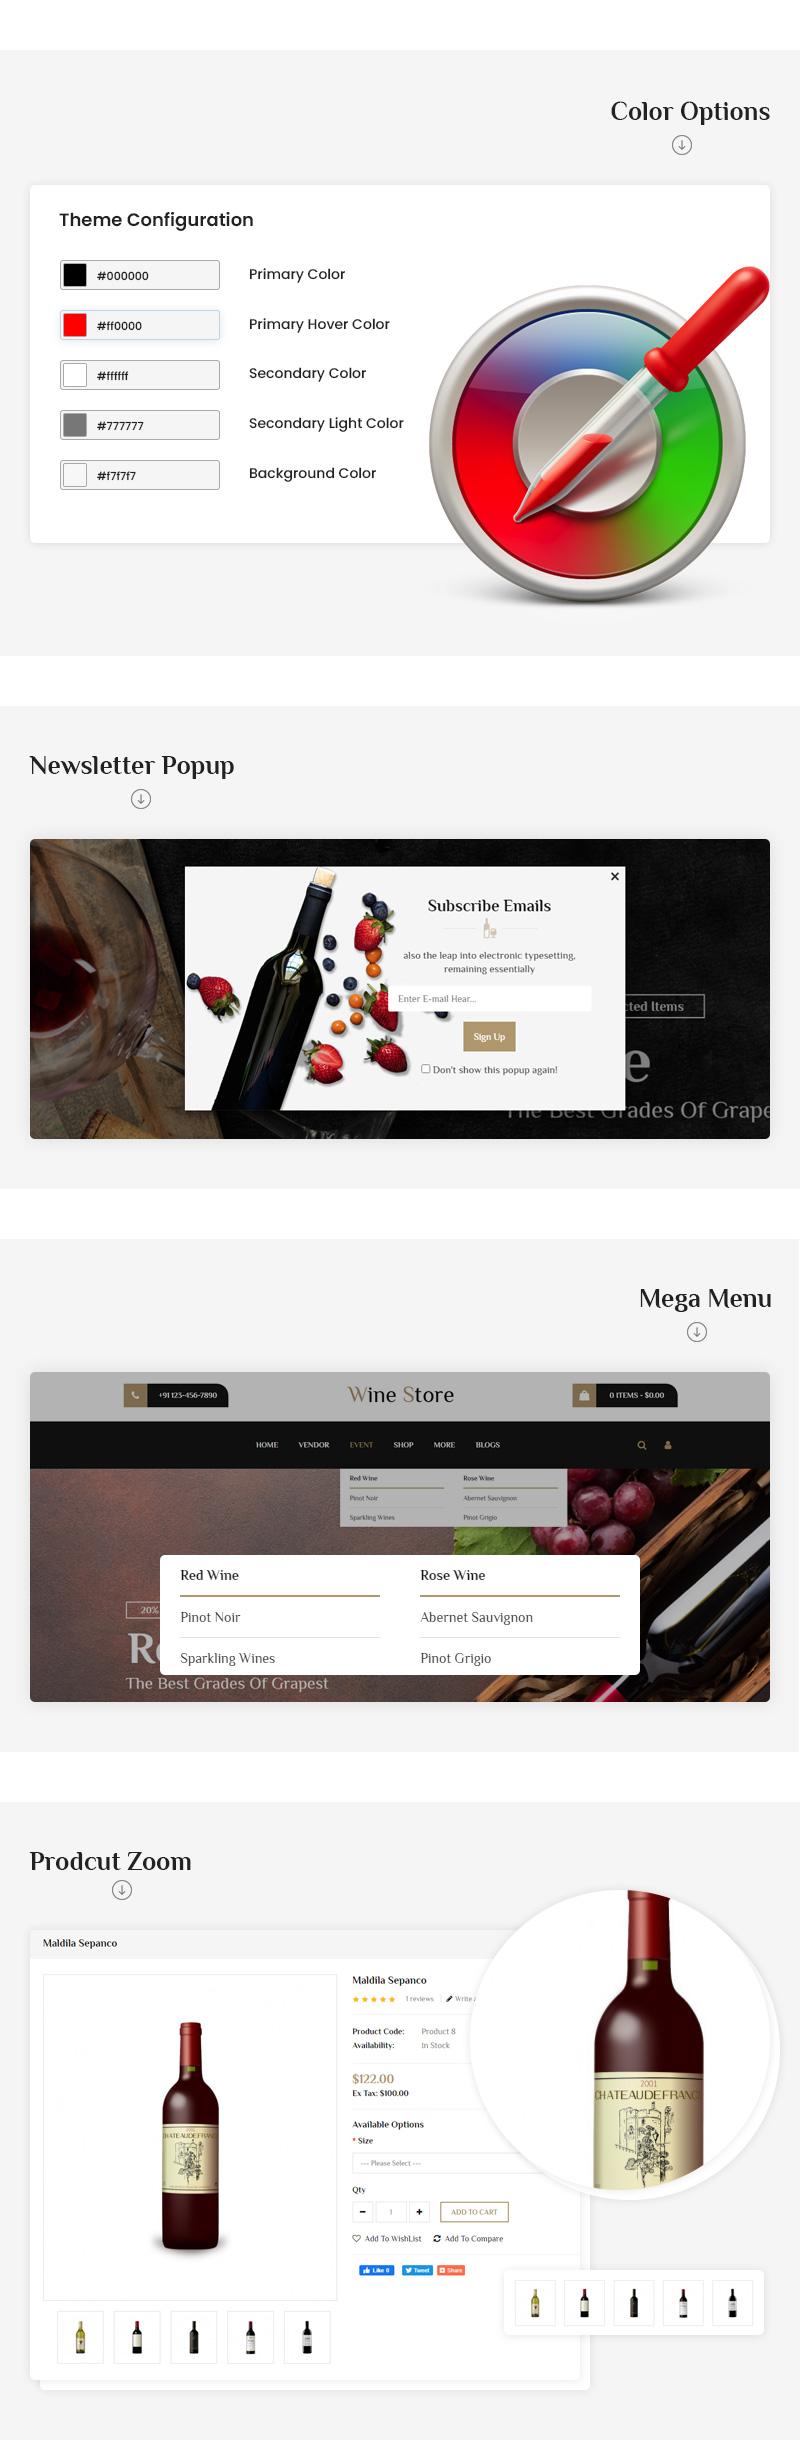 wine-store-features-3.jpg